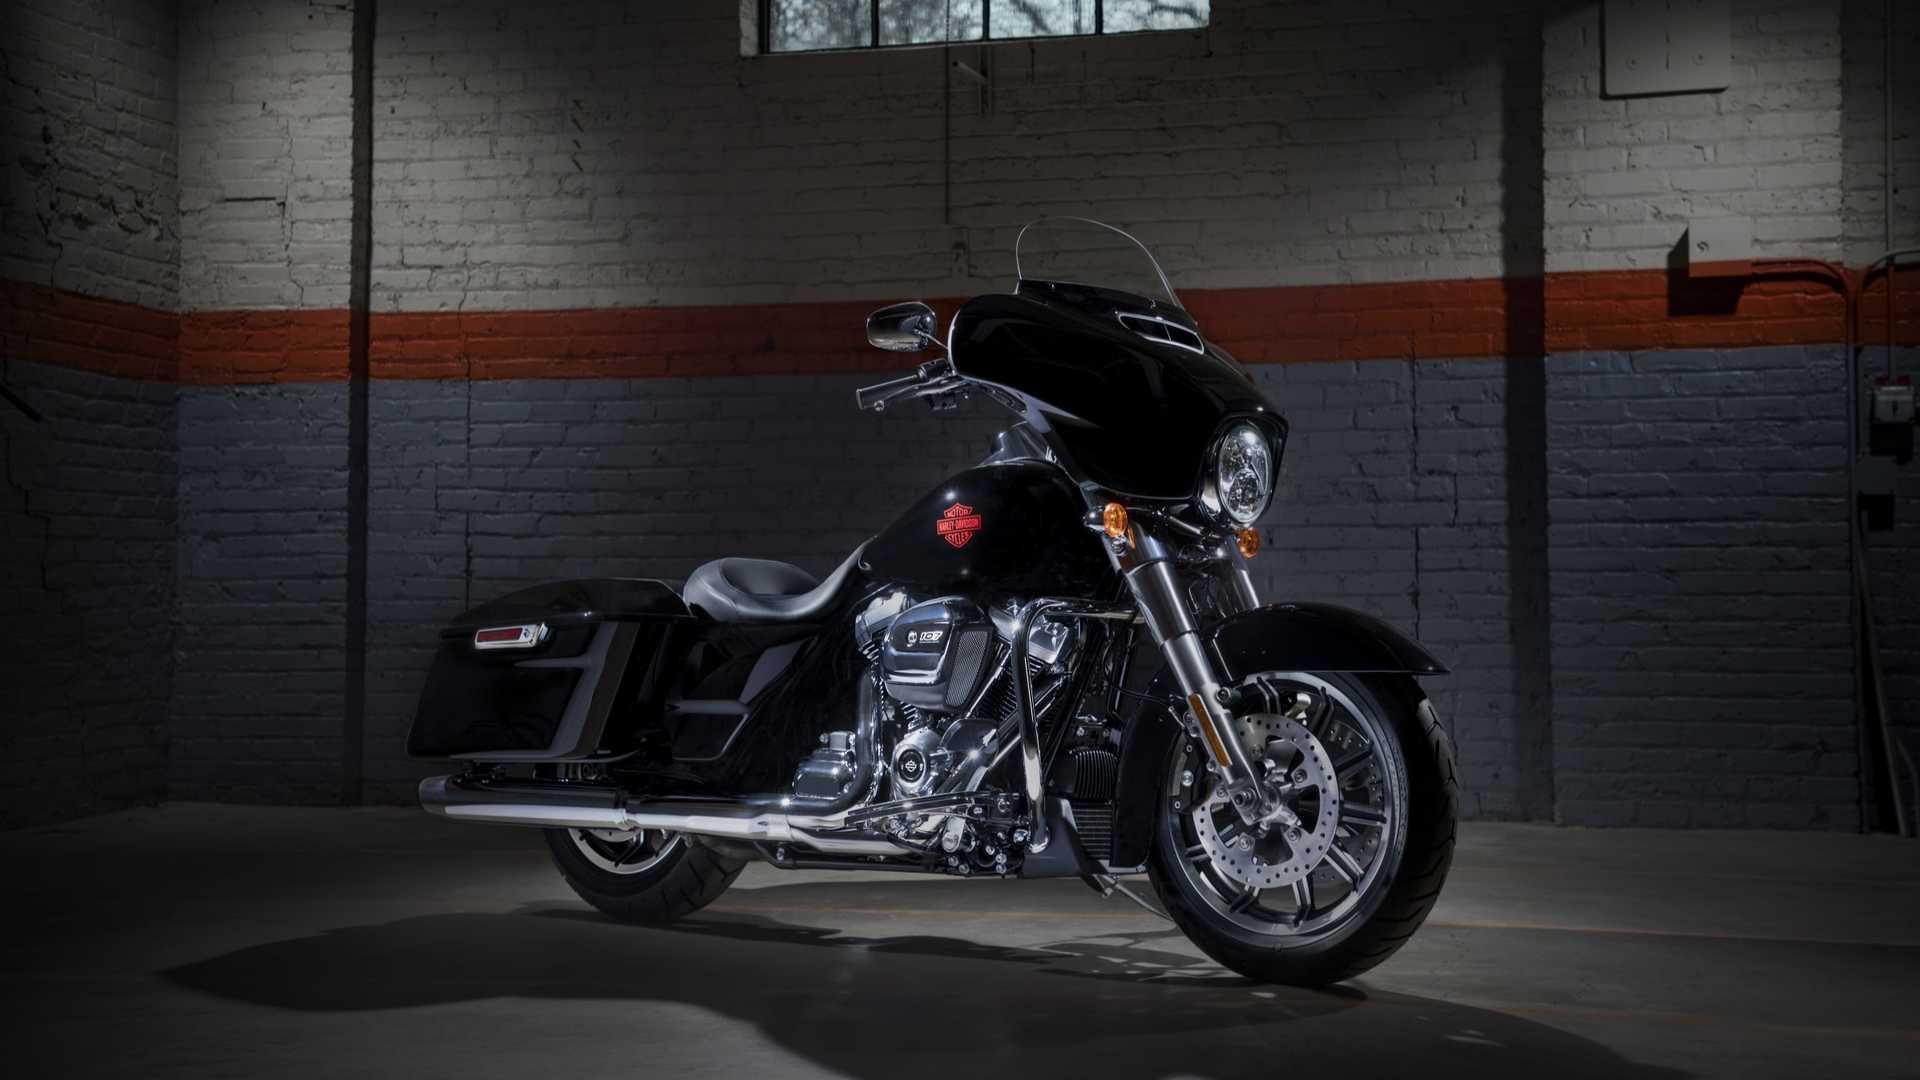 2019 Harley-Davidson FLHT Electra Glide Standard Launched